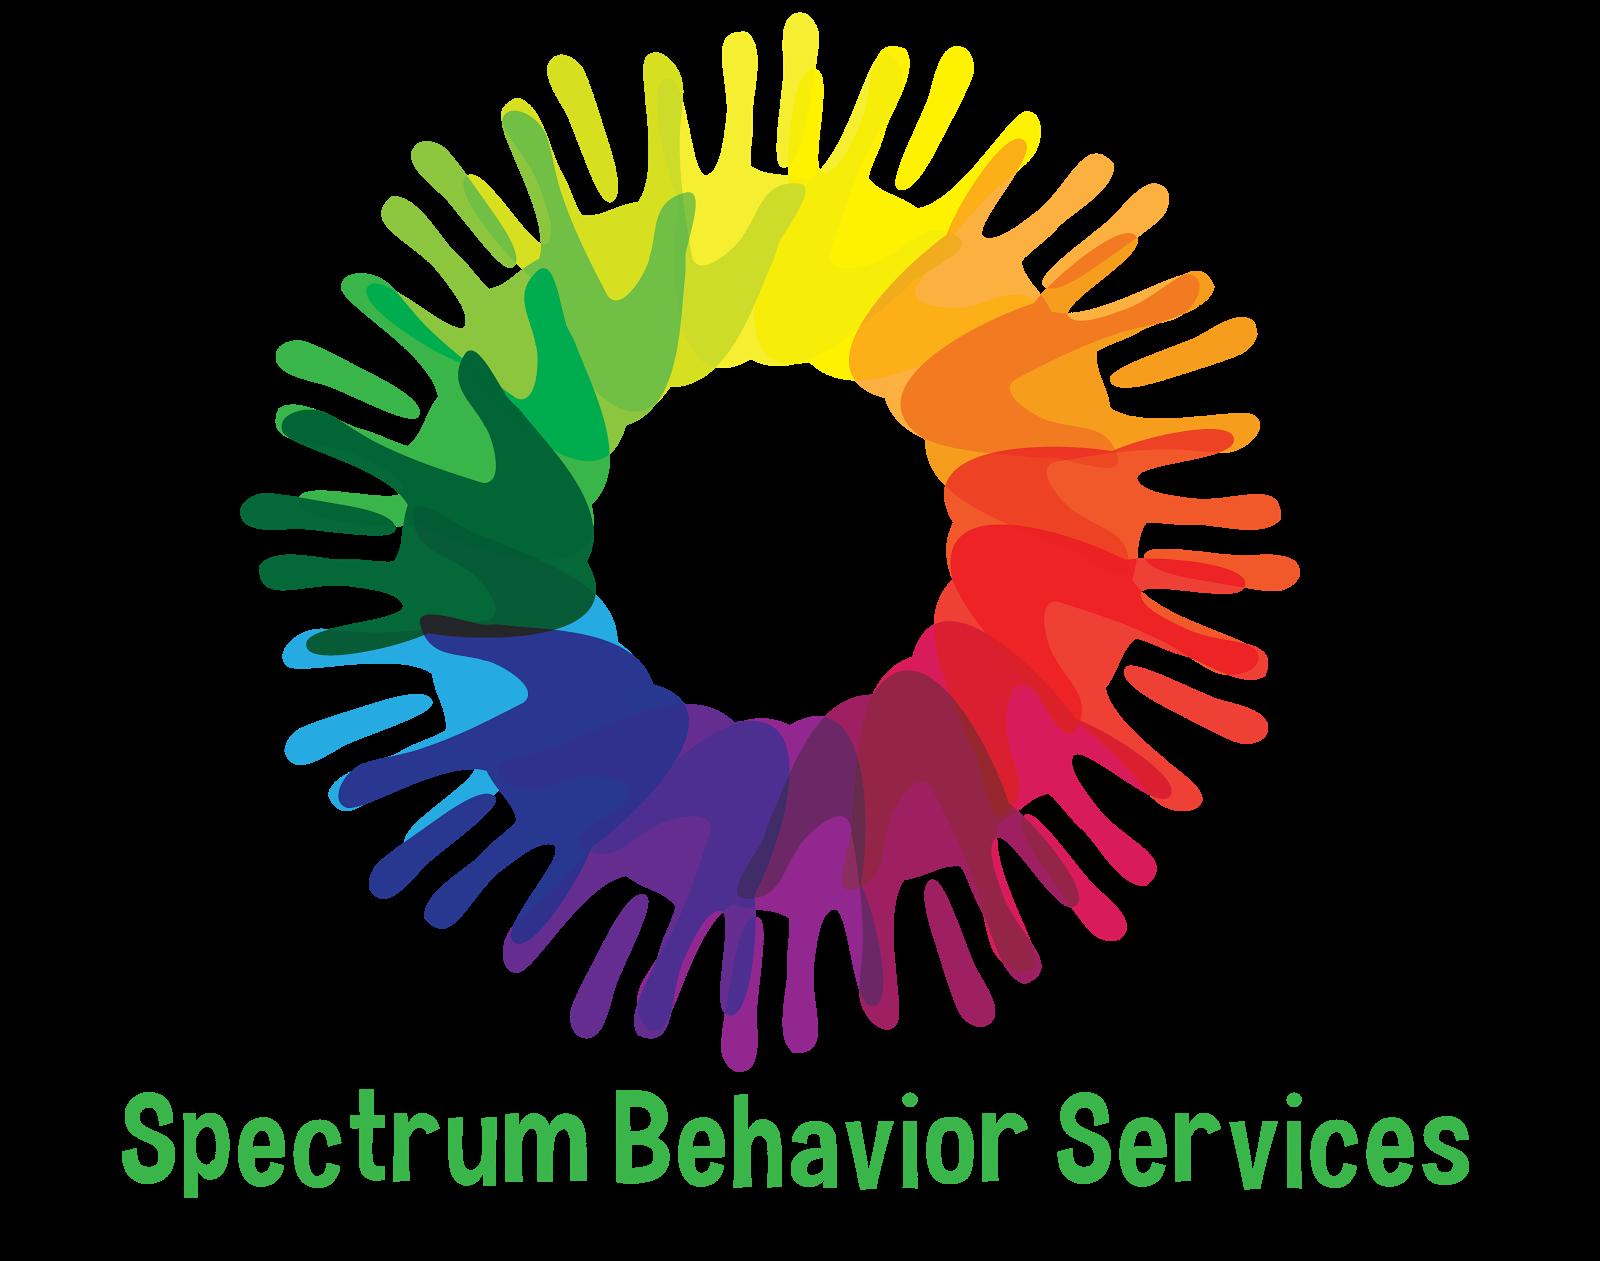 SPECTRUM BEHAVIOR SERVICES